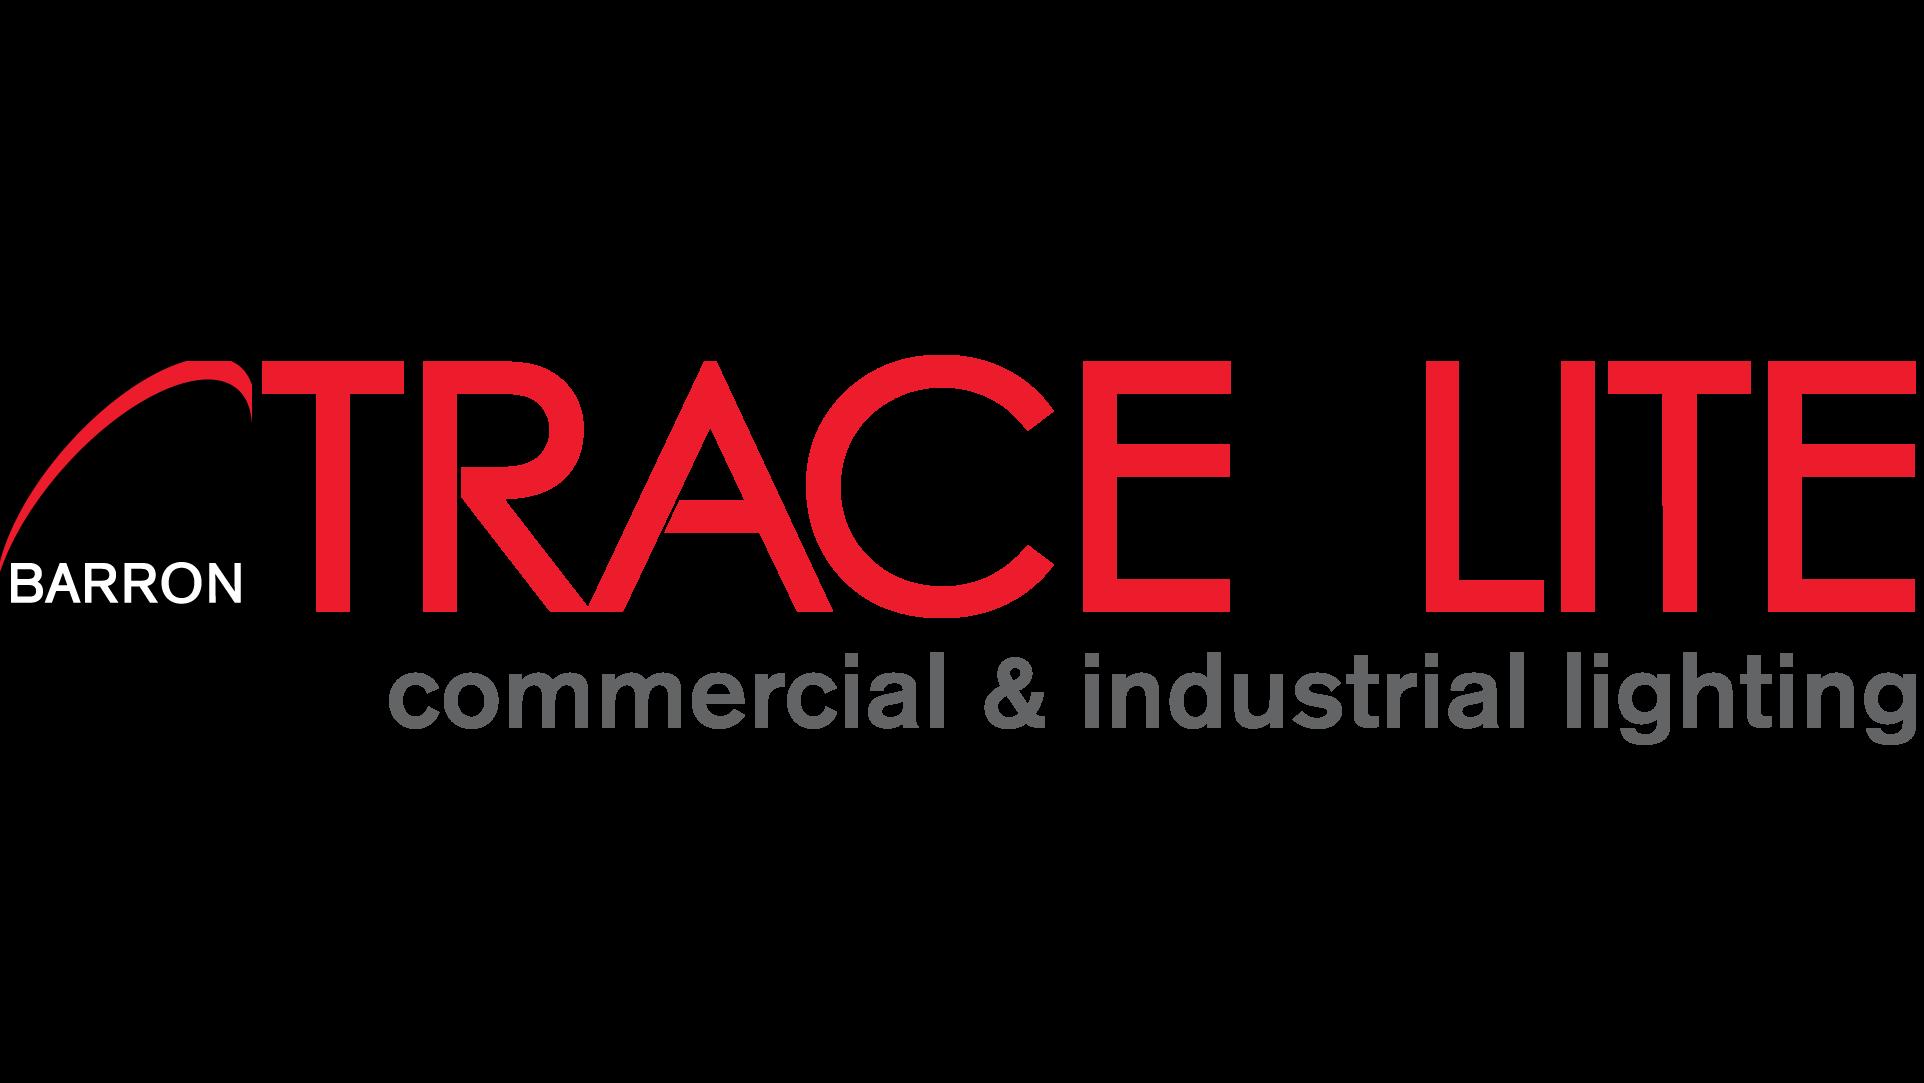 barron_trace-lite_logo.png